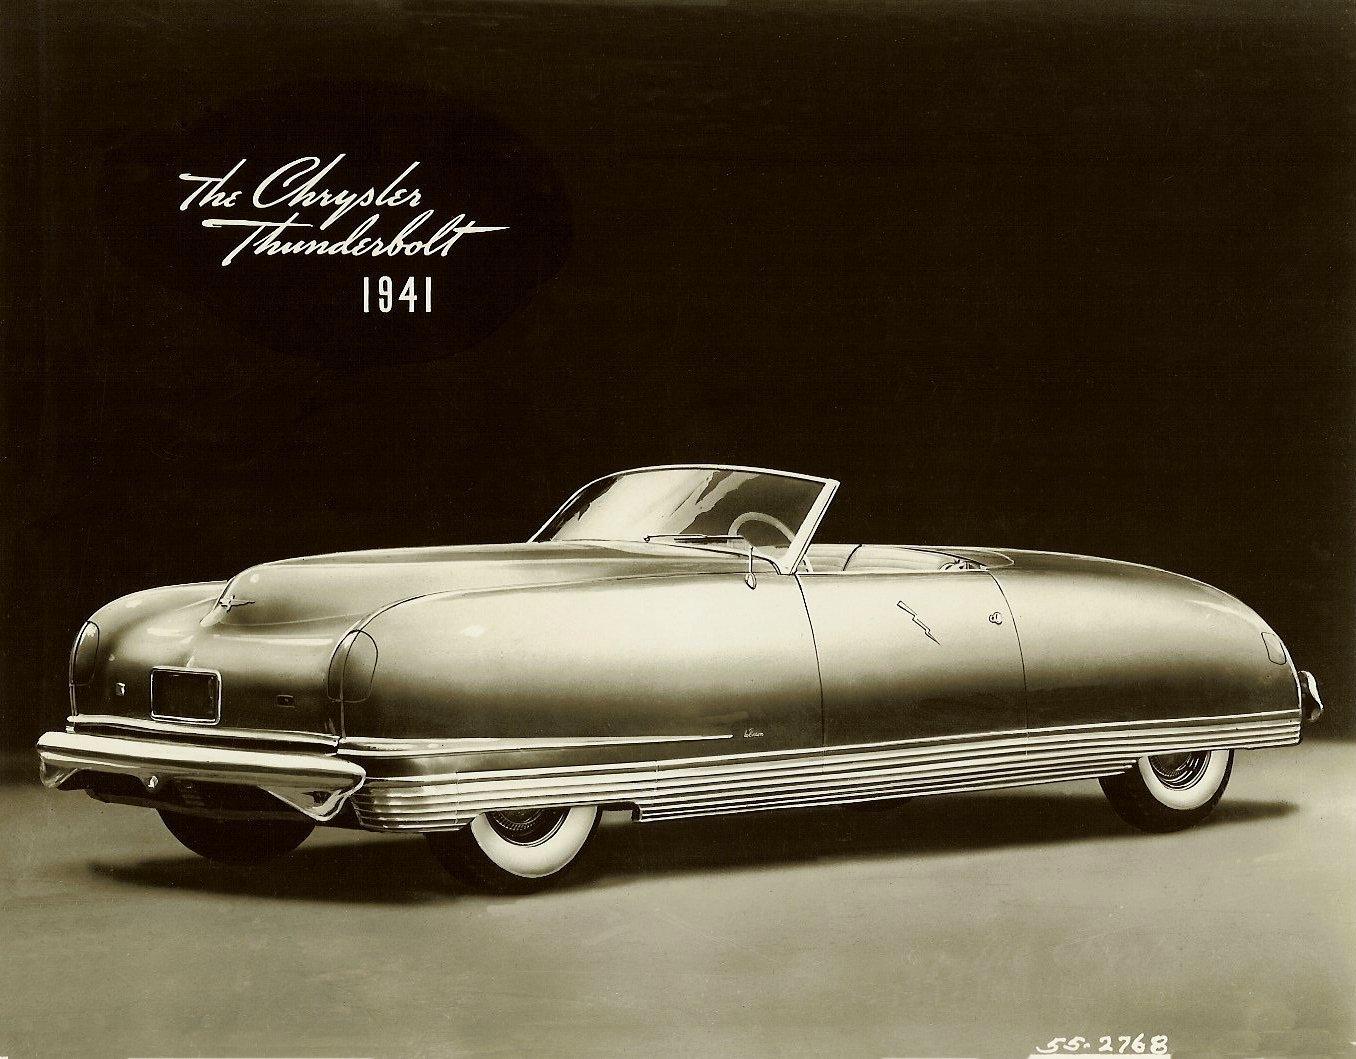 Atlanta Dream Cars Showcase - 1941 Chrysler Thunderbolt Is Aero Convertible Coupe 1